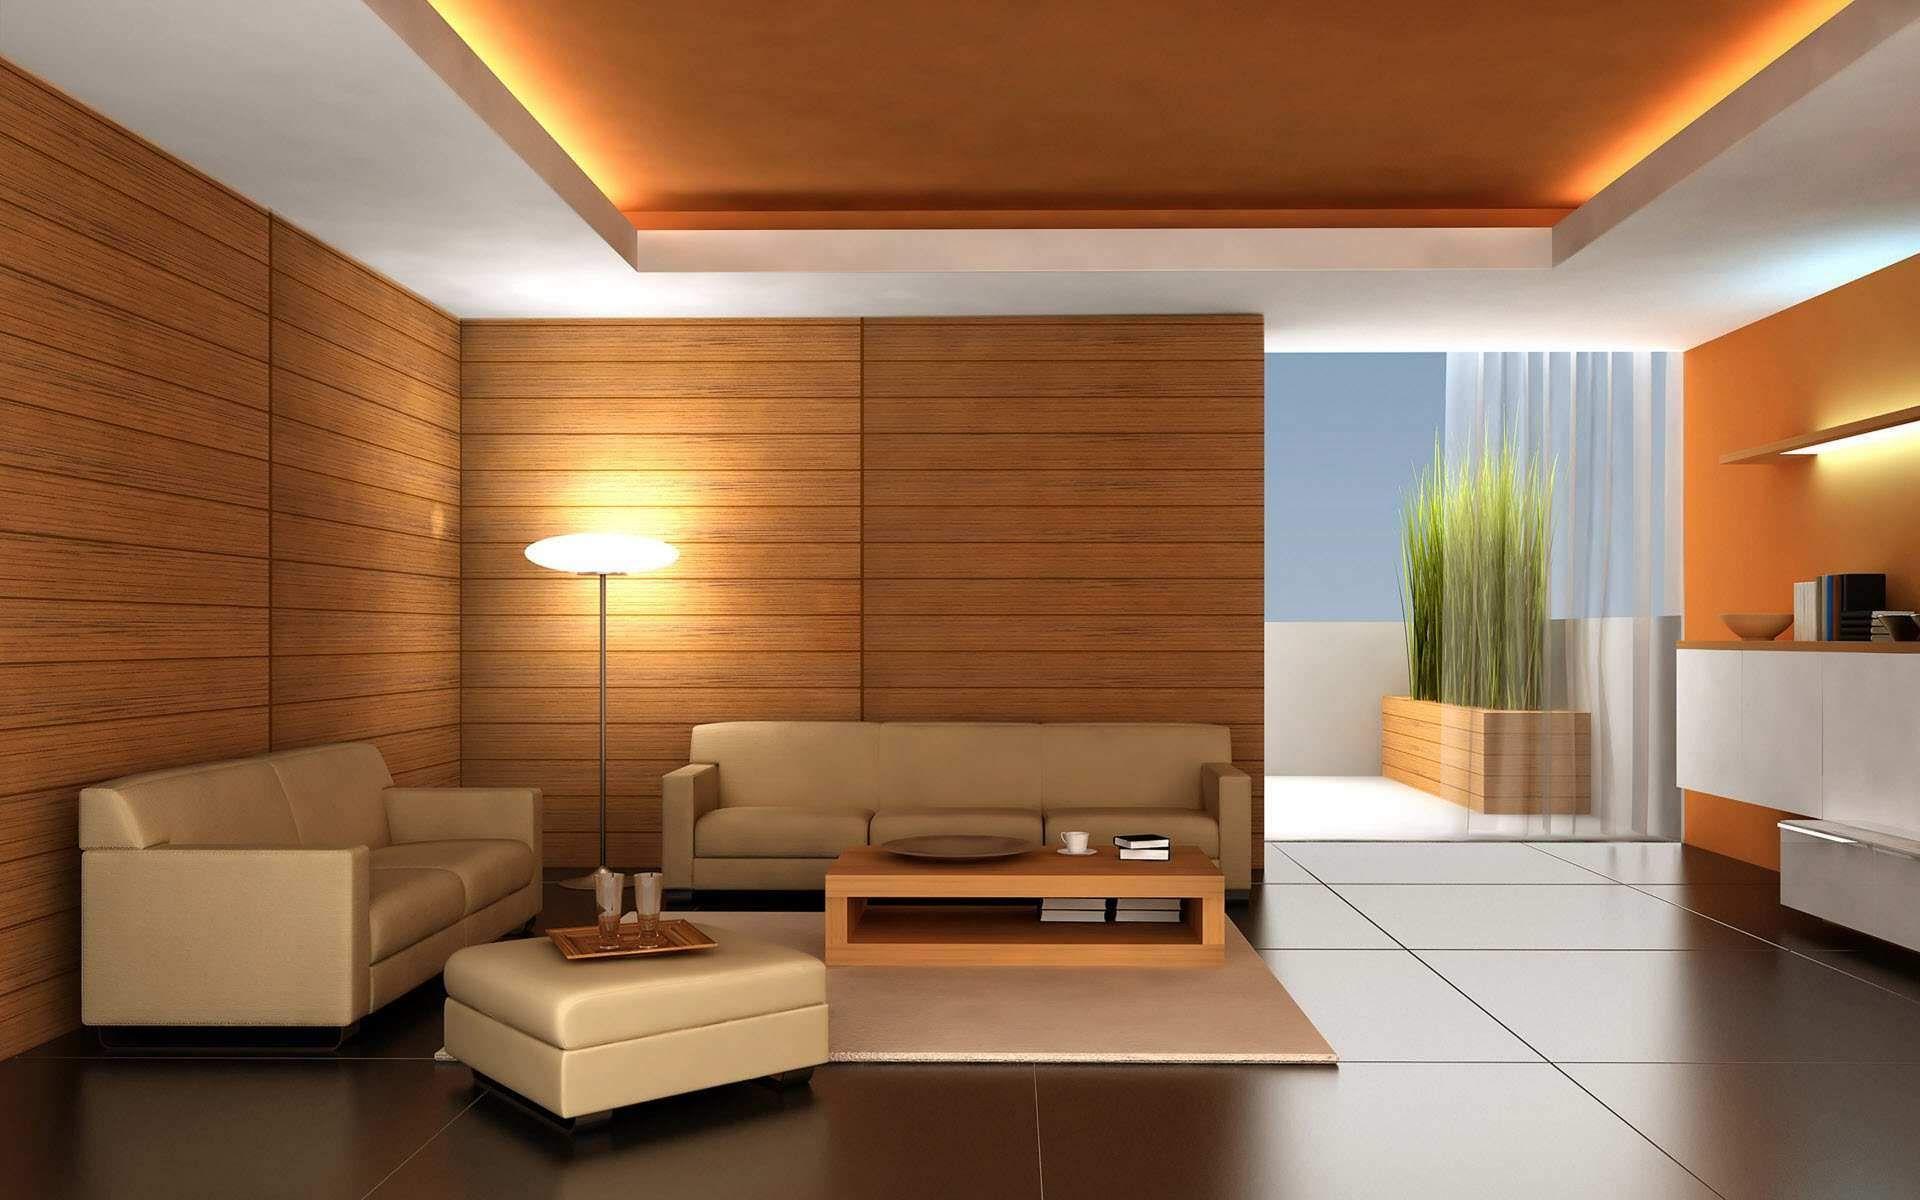 25 modern pop false ceiling designs for living room modern living room interior for minimalist houses - Interior House Design Ideas